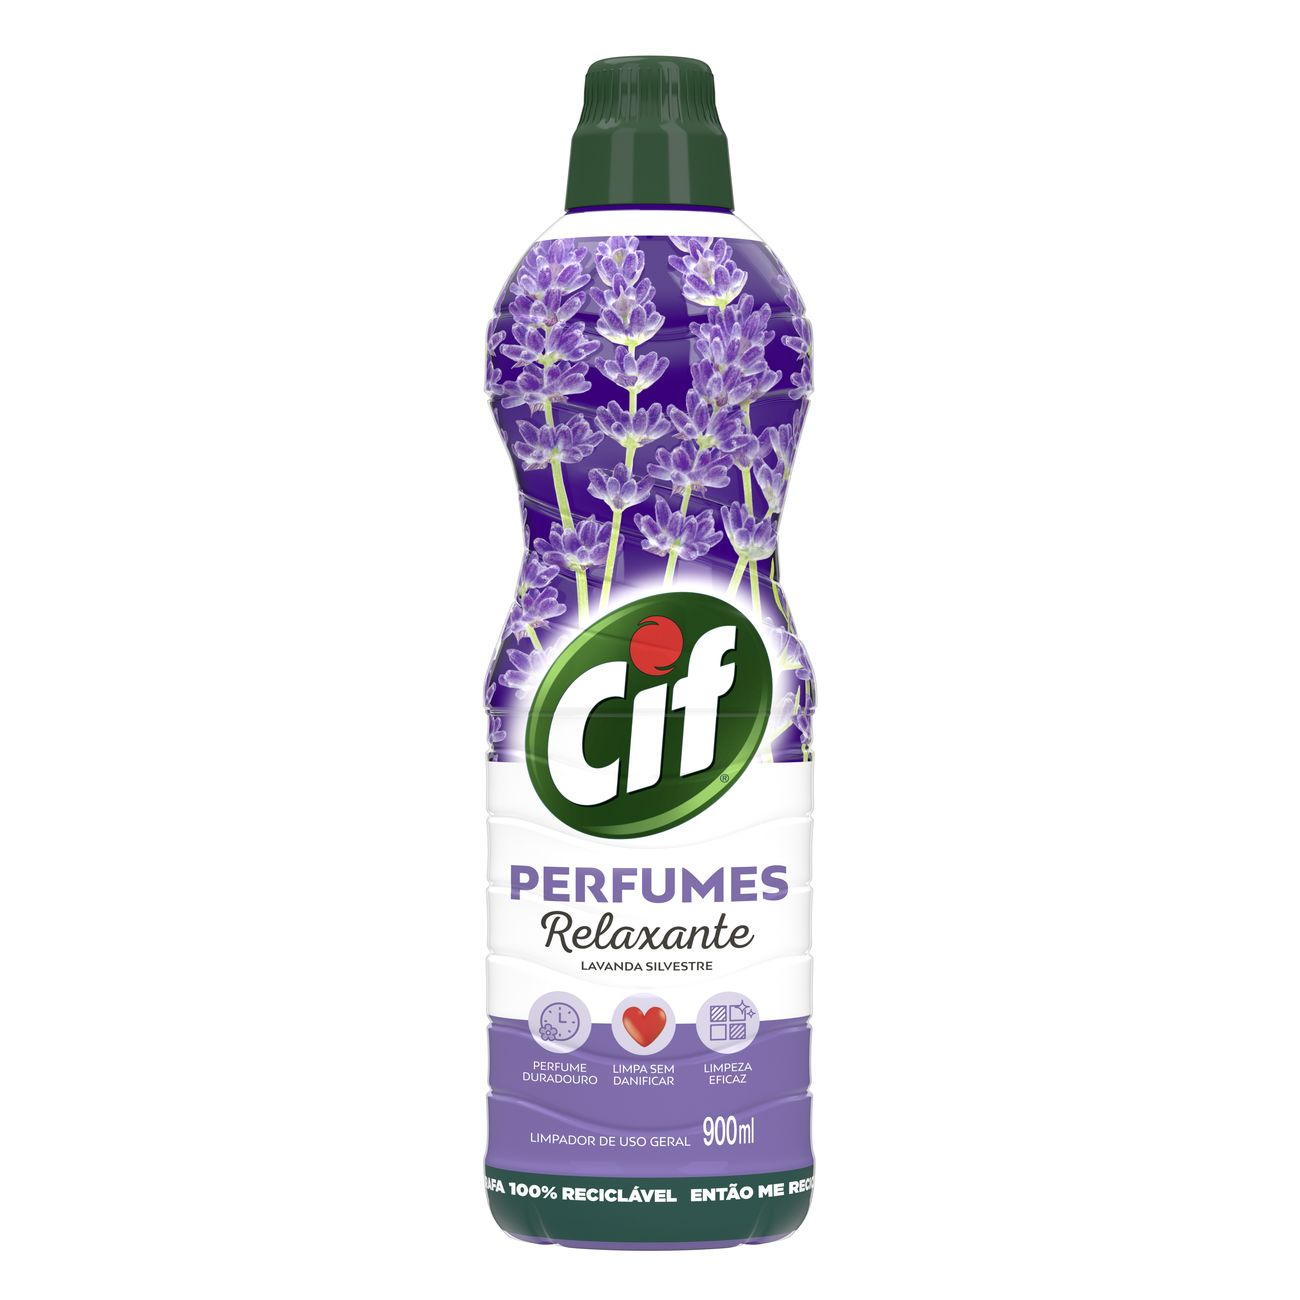 Limpa Pisos Cif Perfumes Relaxante 900mL